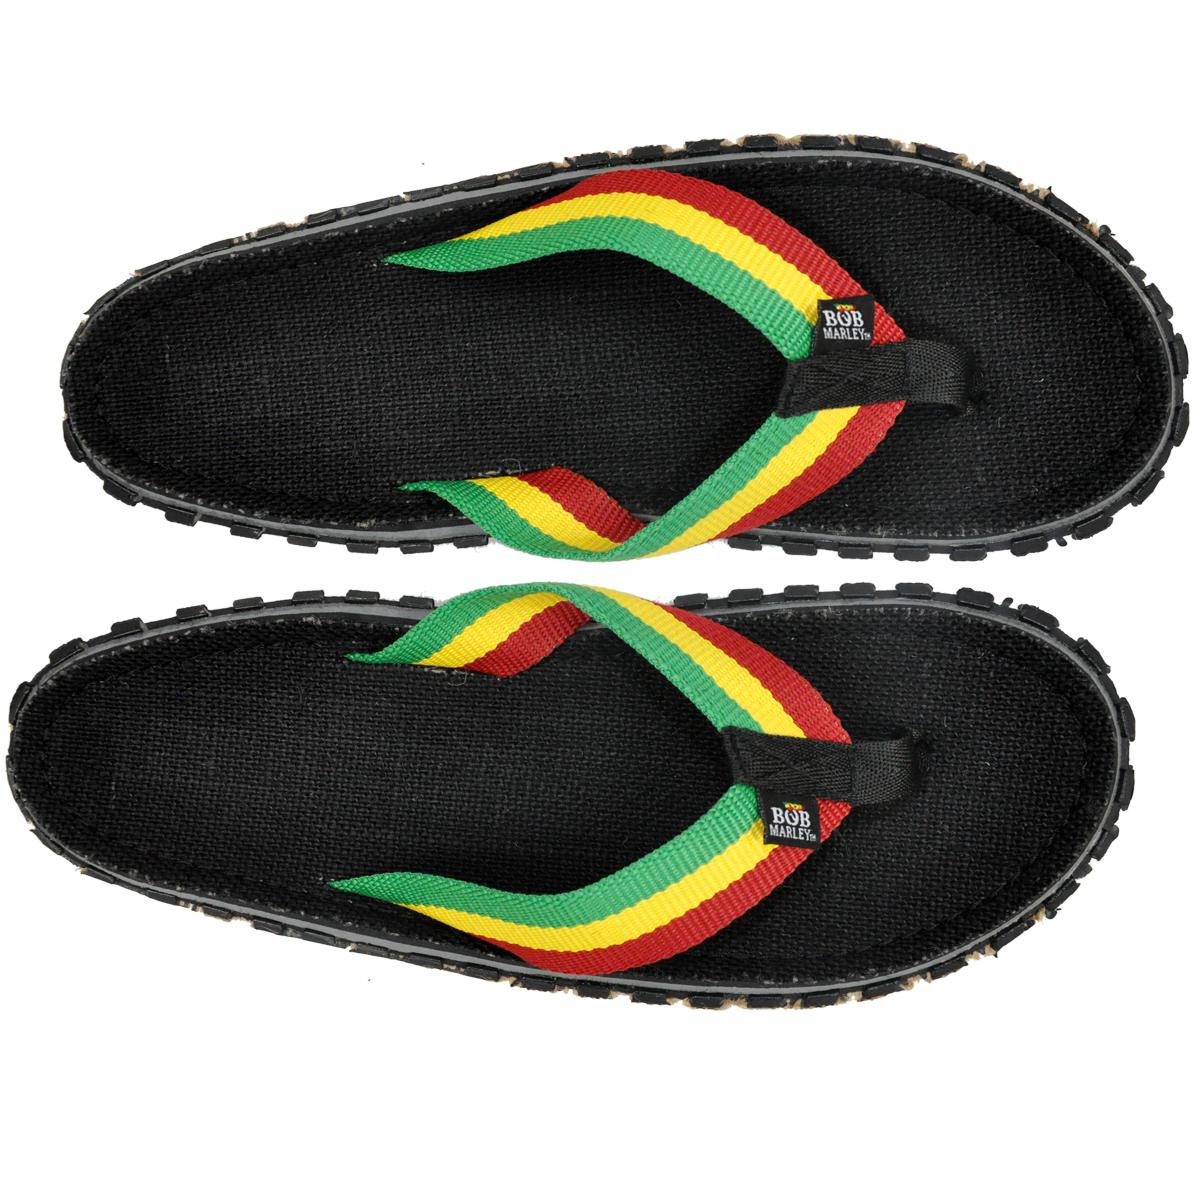 Outstanding Mens Bob Marley Fresco Sandals Bob Marley Shoes Rastaempire Com Hairstyles For Women Draintrainus